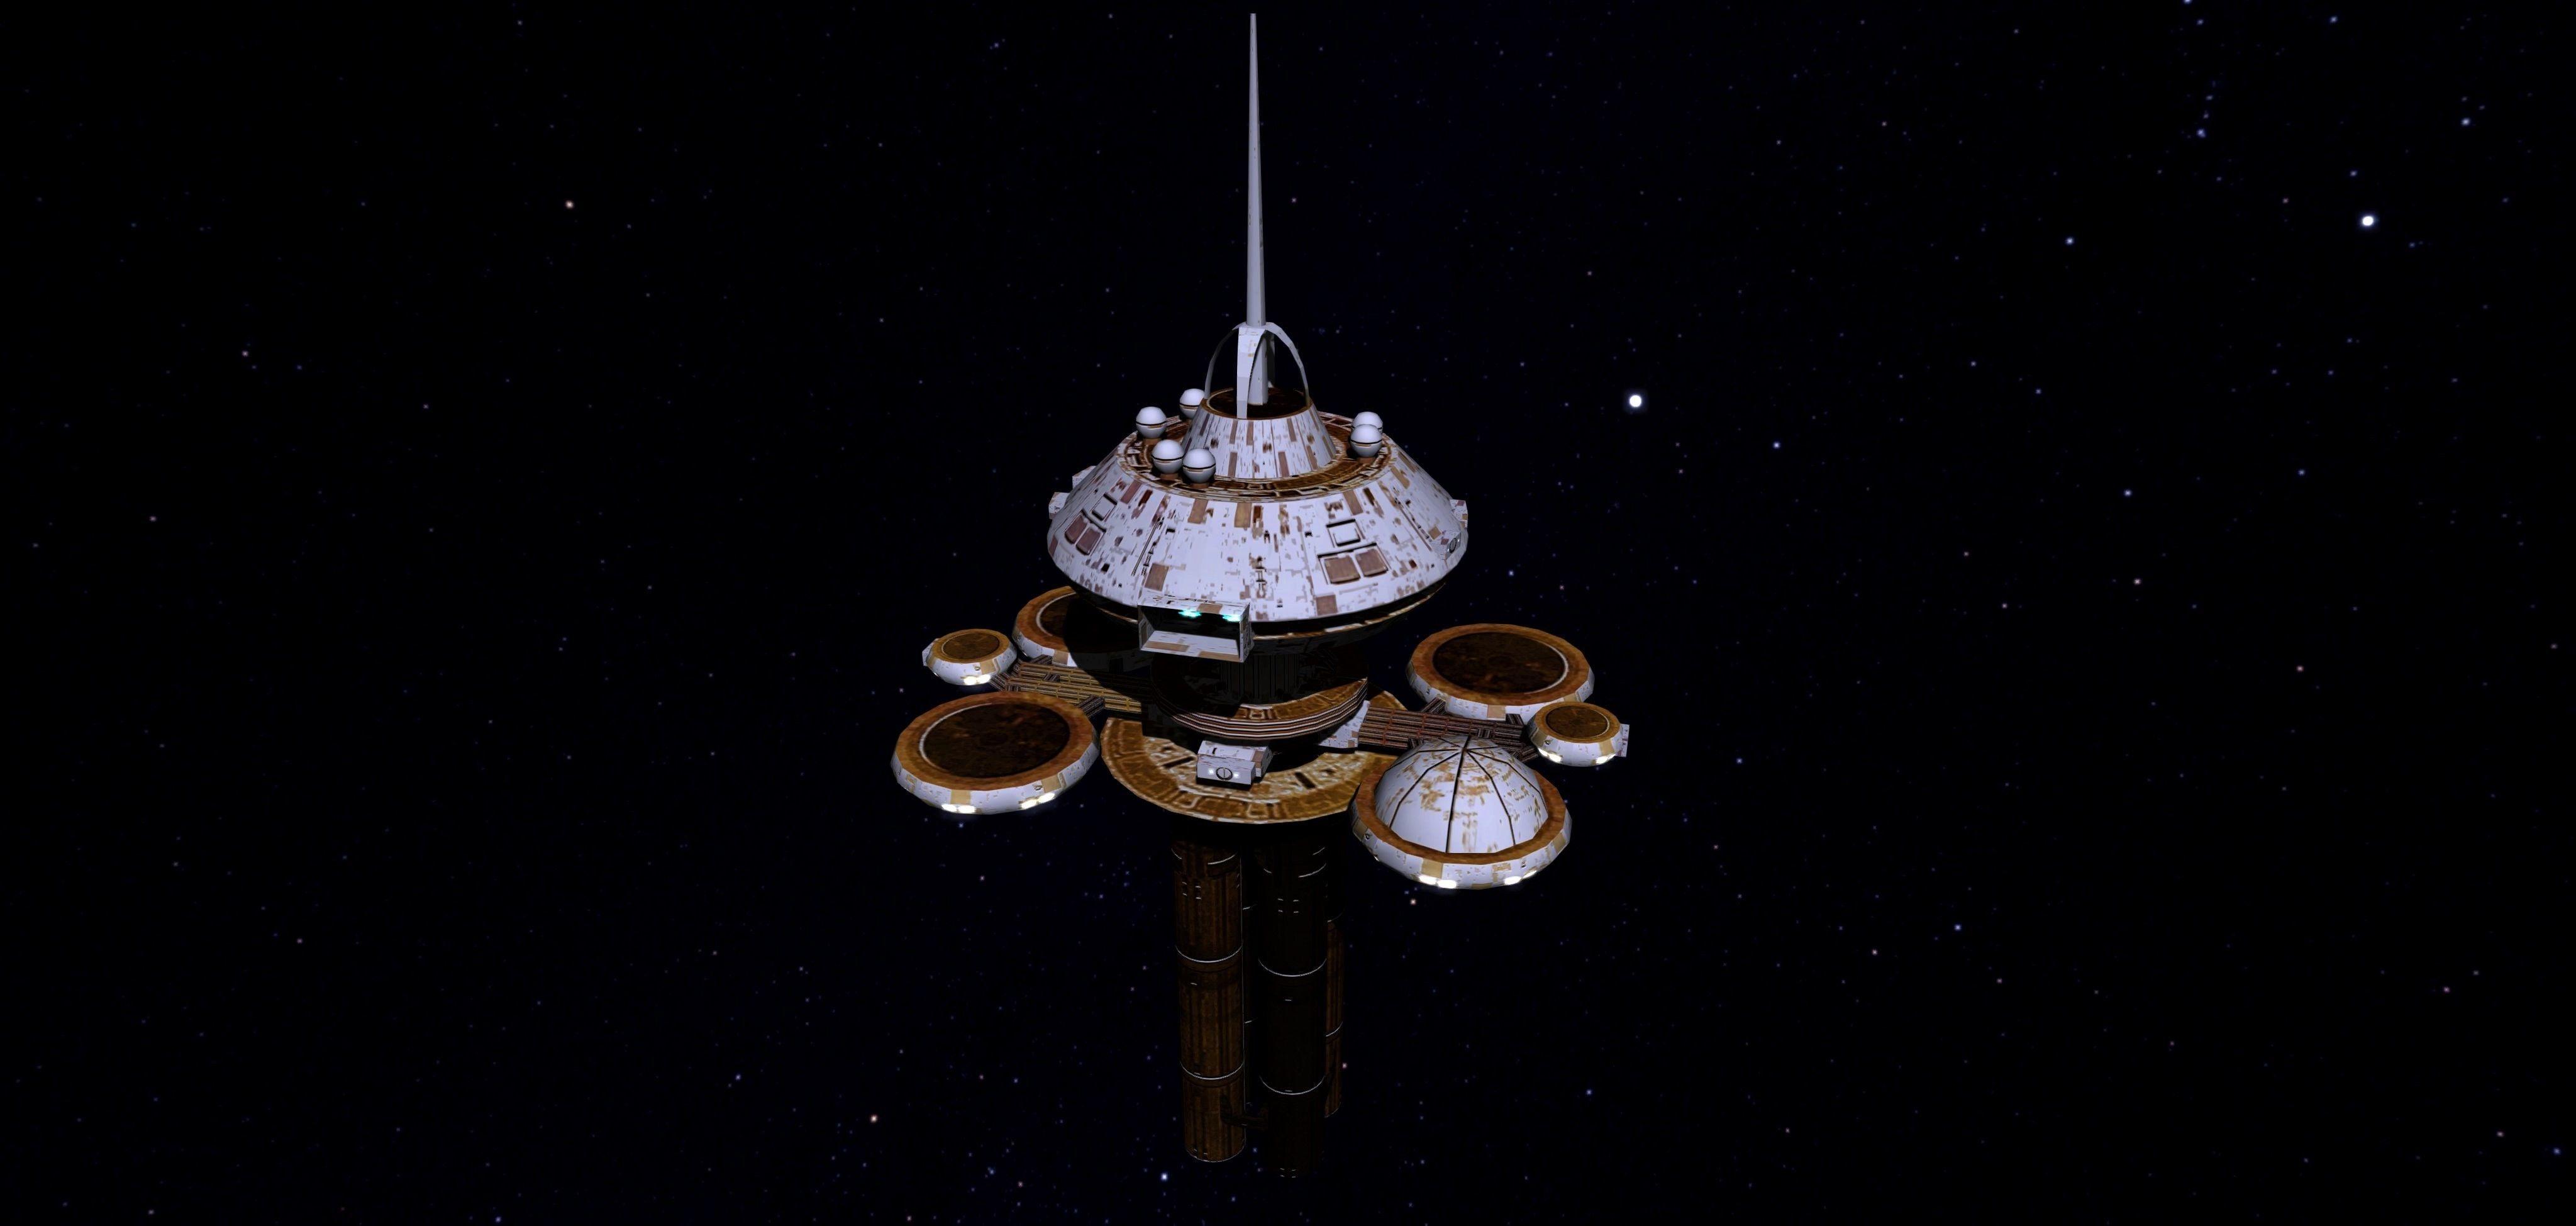 STAR TREK - REGULA SPACE STATION